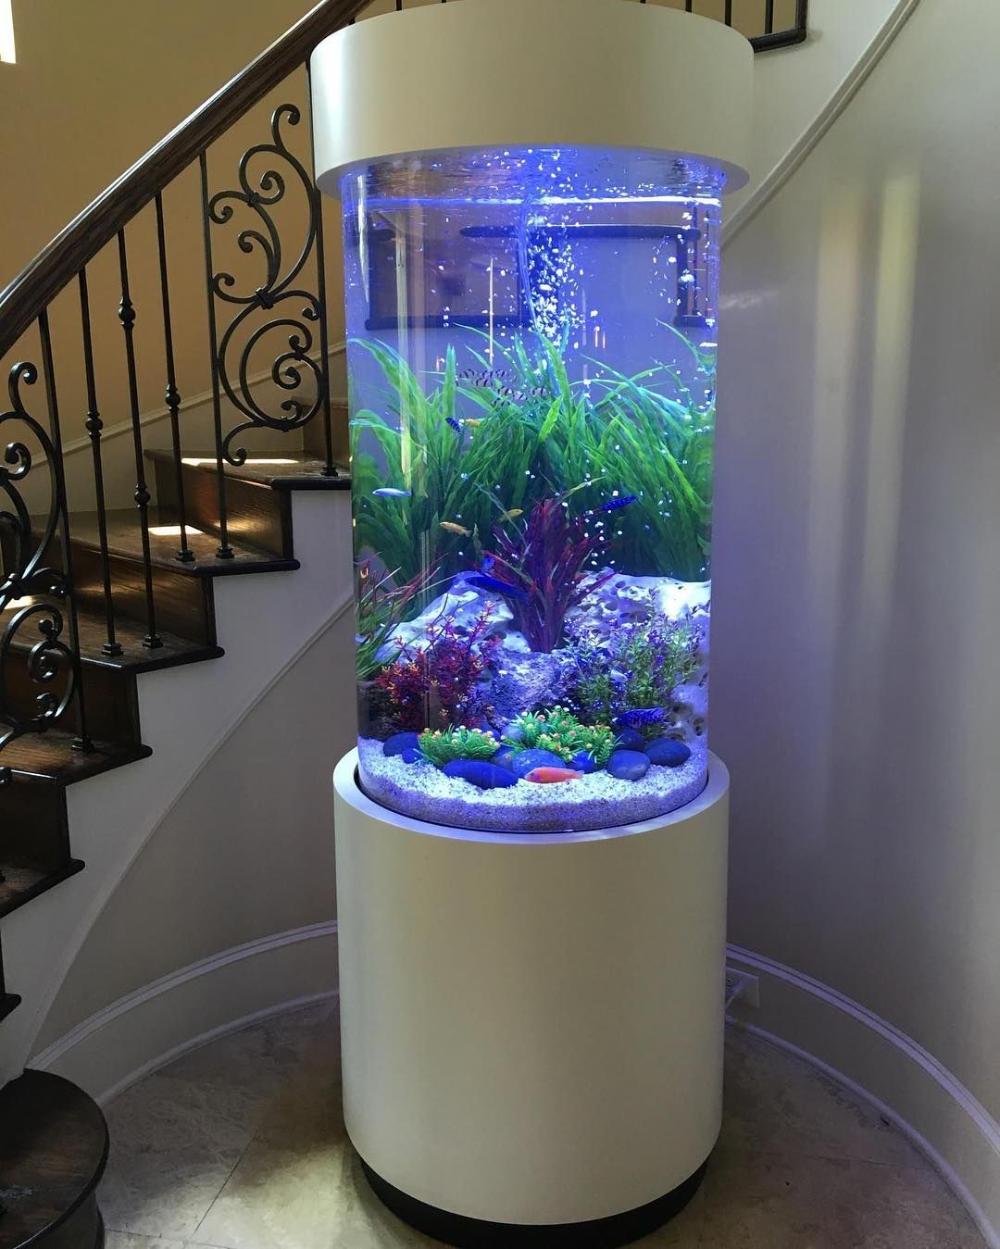 Best Ideas To Arrange An Aquarium Or Fish Tank In Home